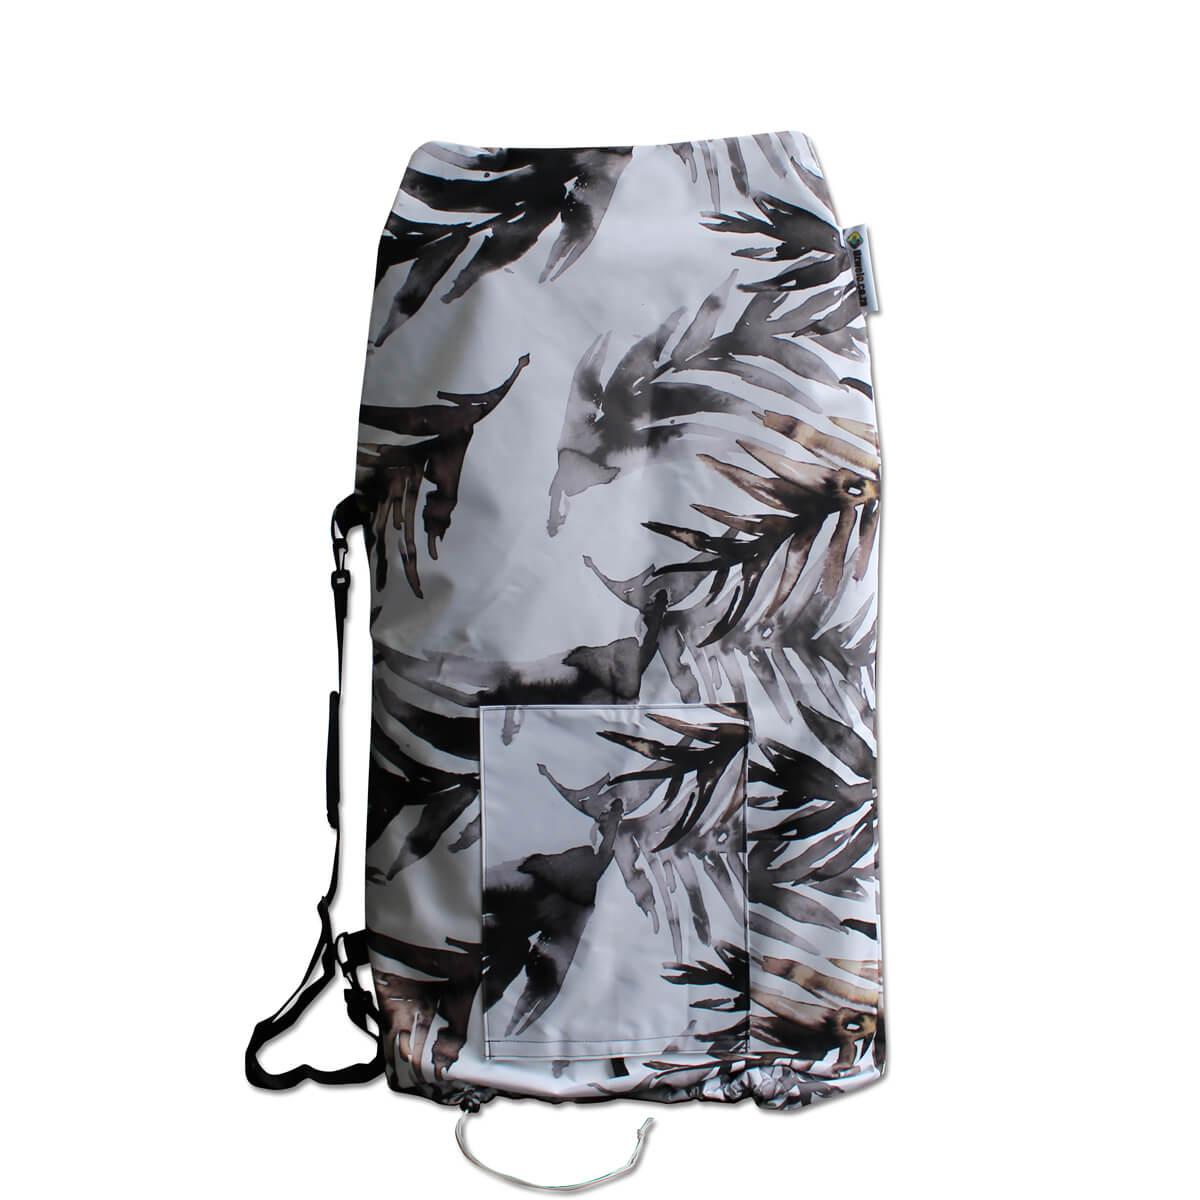 Body-Board-bag